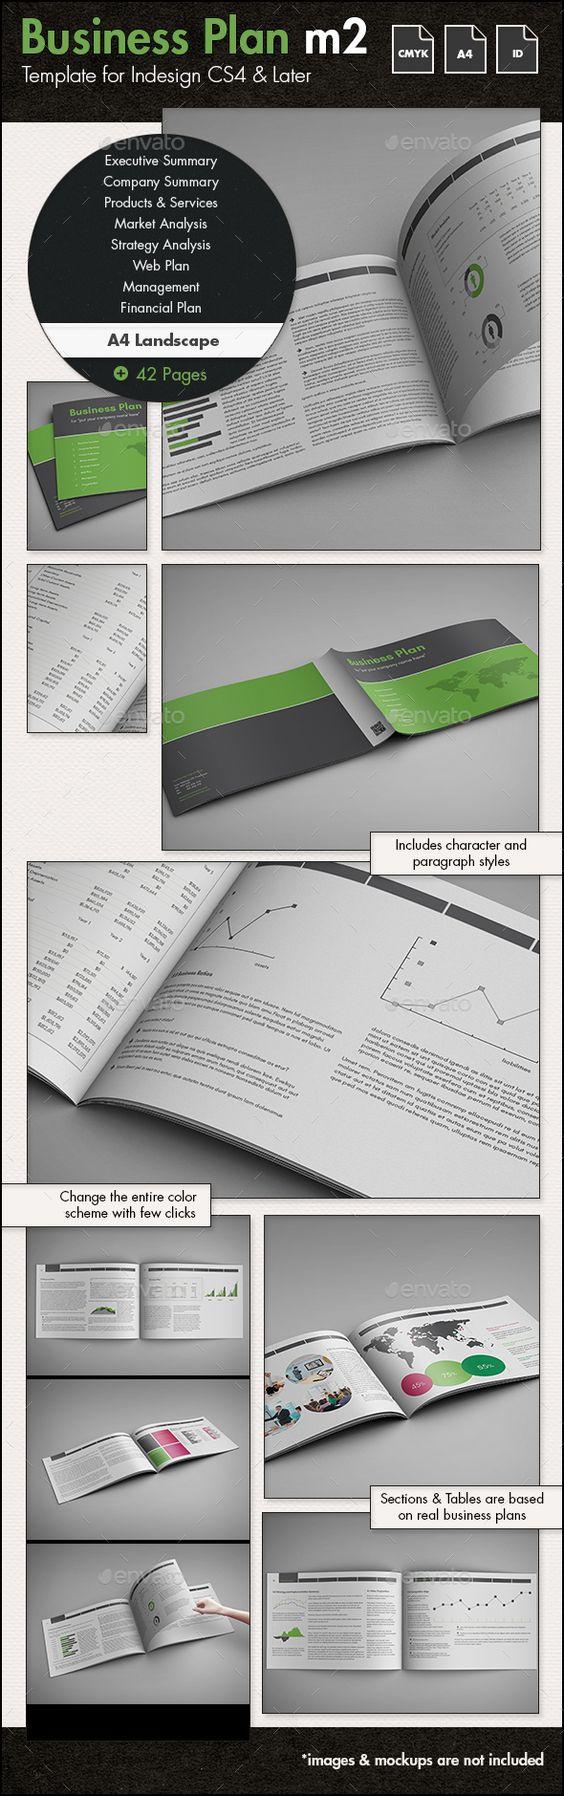 Landscape design business plan